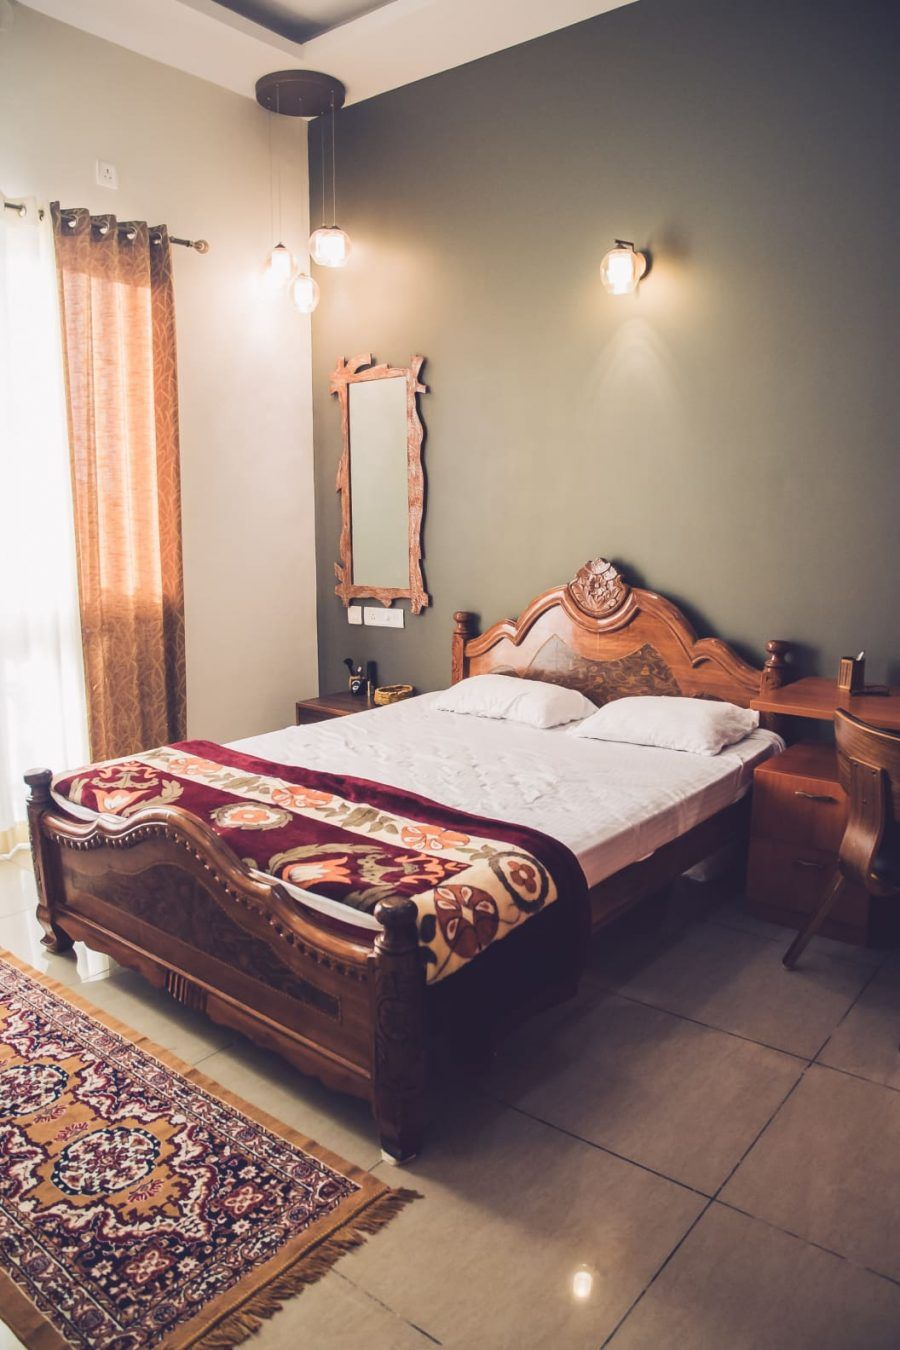 6 Unique Bedroom Wall Paint Colours That Work For Indian Homes In 2020 Bedroom Wall Paint Colors Bedroom Wall Paint Indian Bedroom Decor